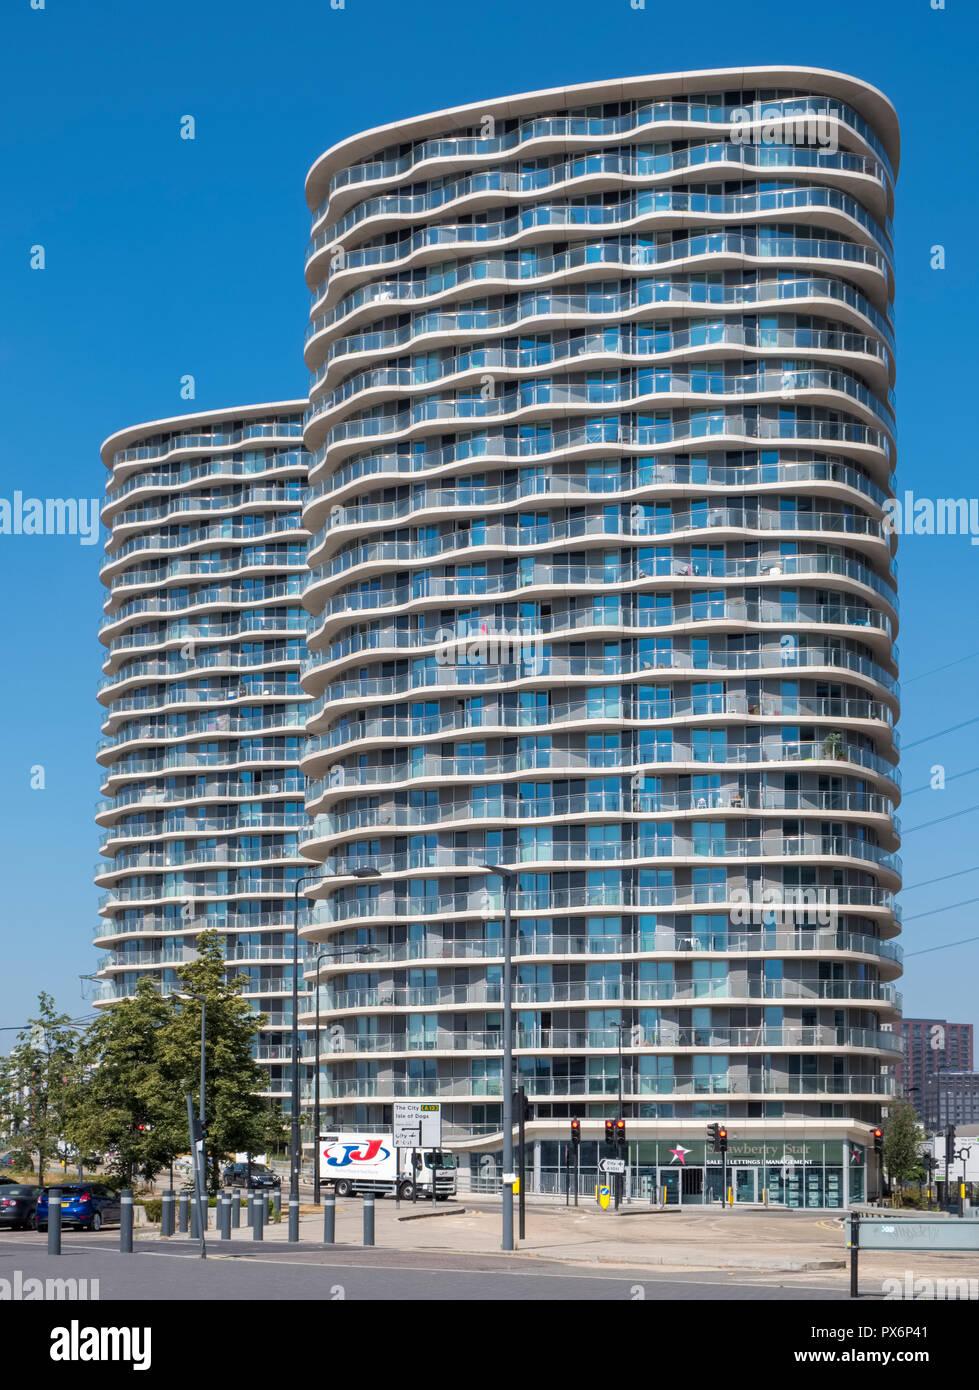 High-rise apartment Gebäude am Royal Victoria Dock, London, England, UK, moderne Architektur Stockbild